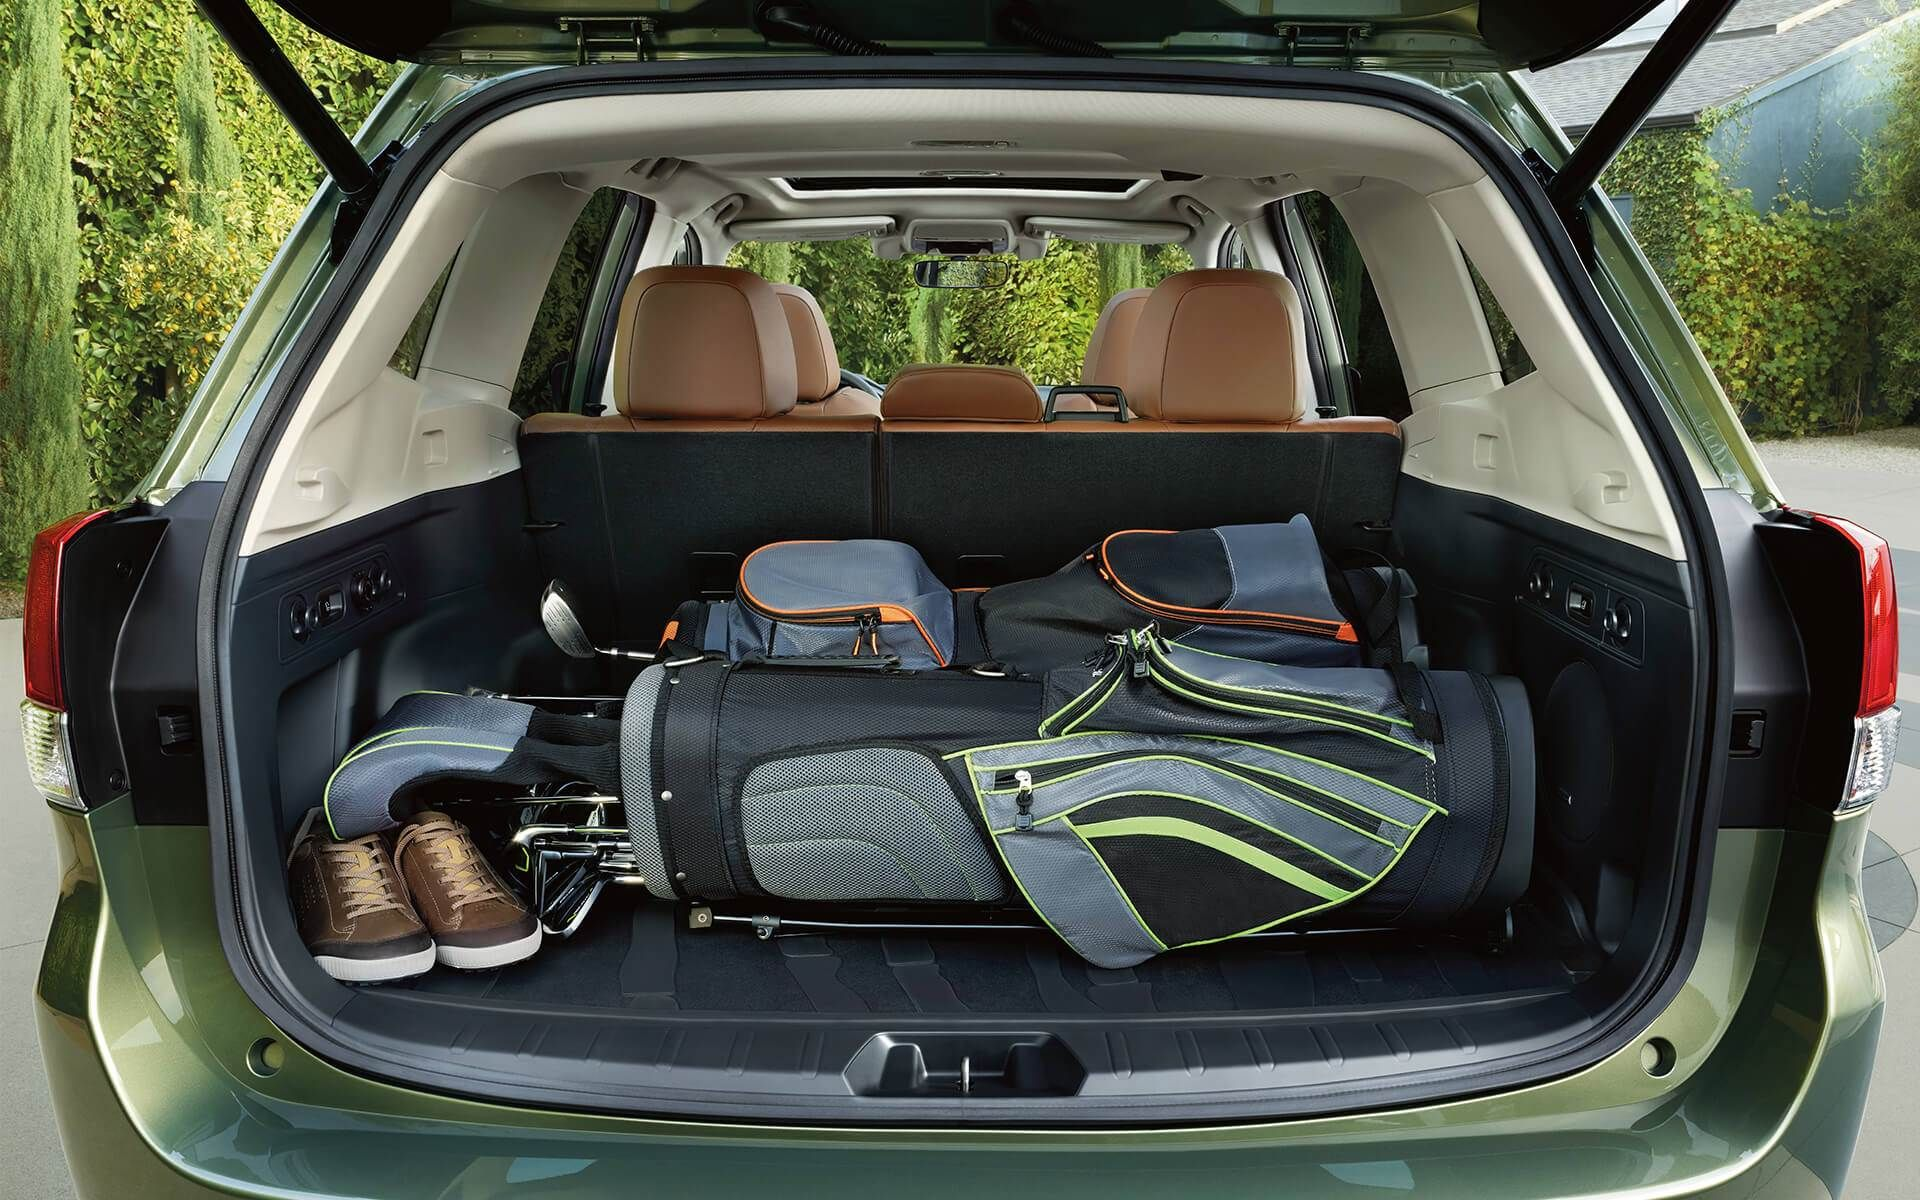 2019 Subaru Forester Photos & Videos Subaru Subaru